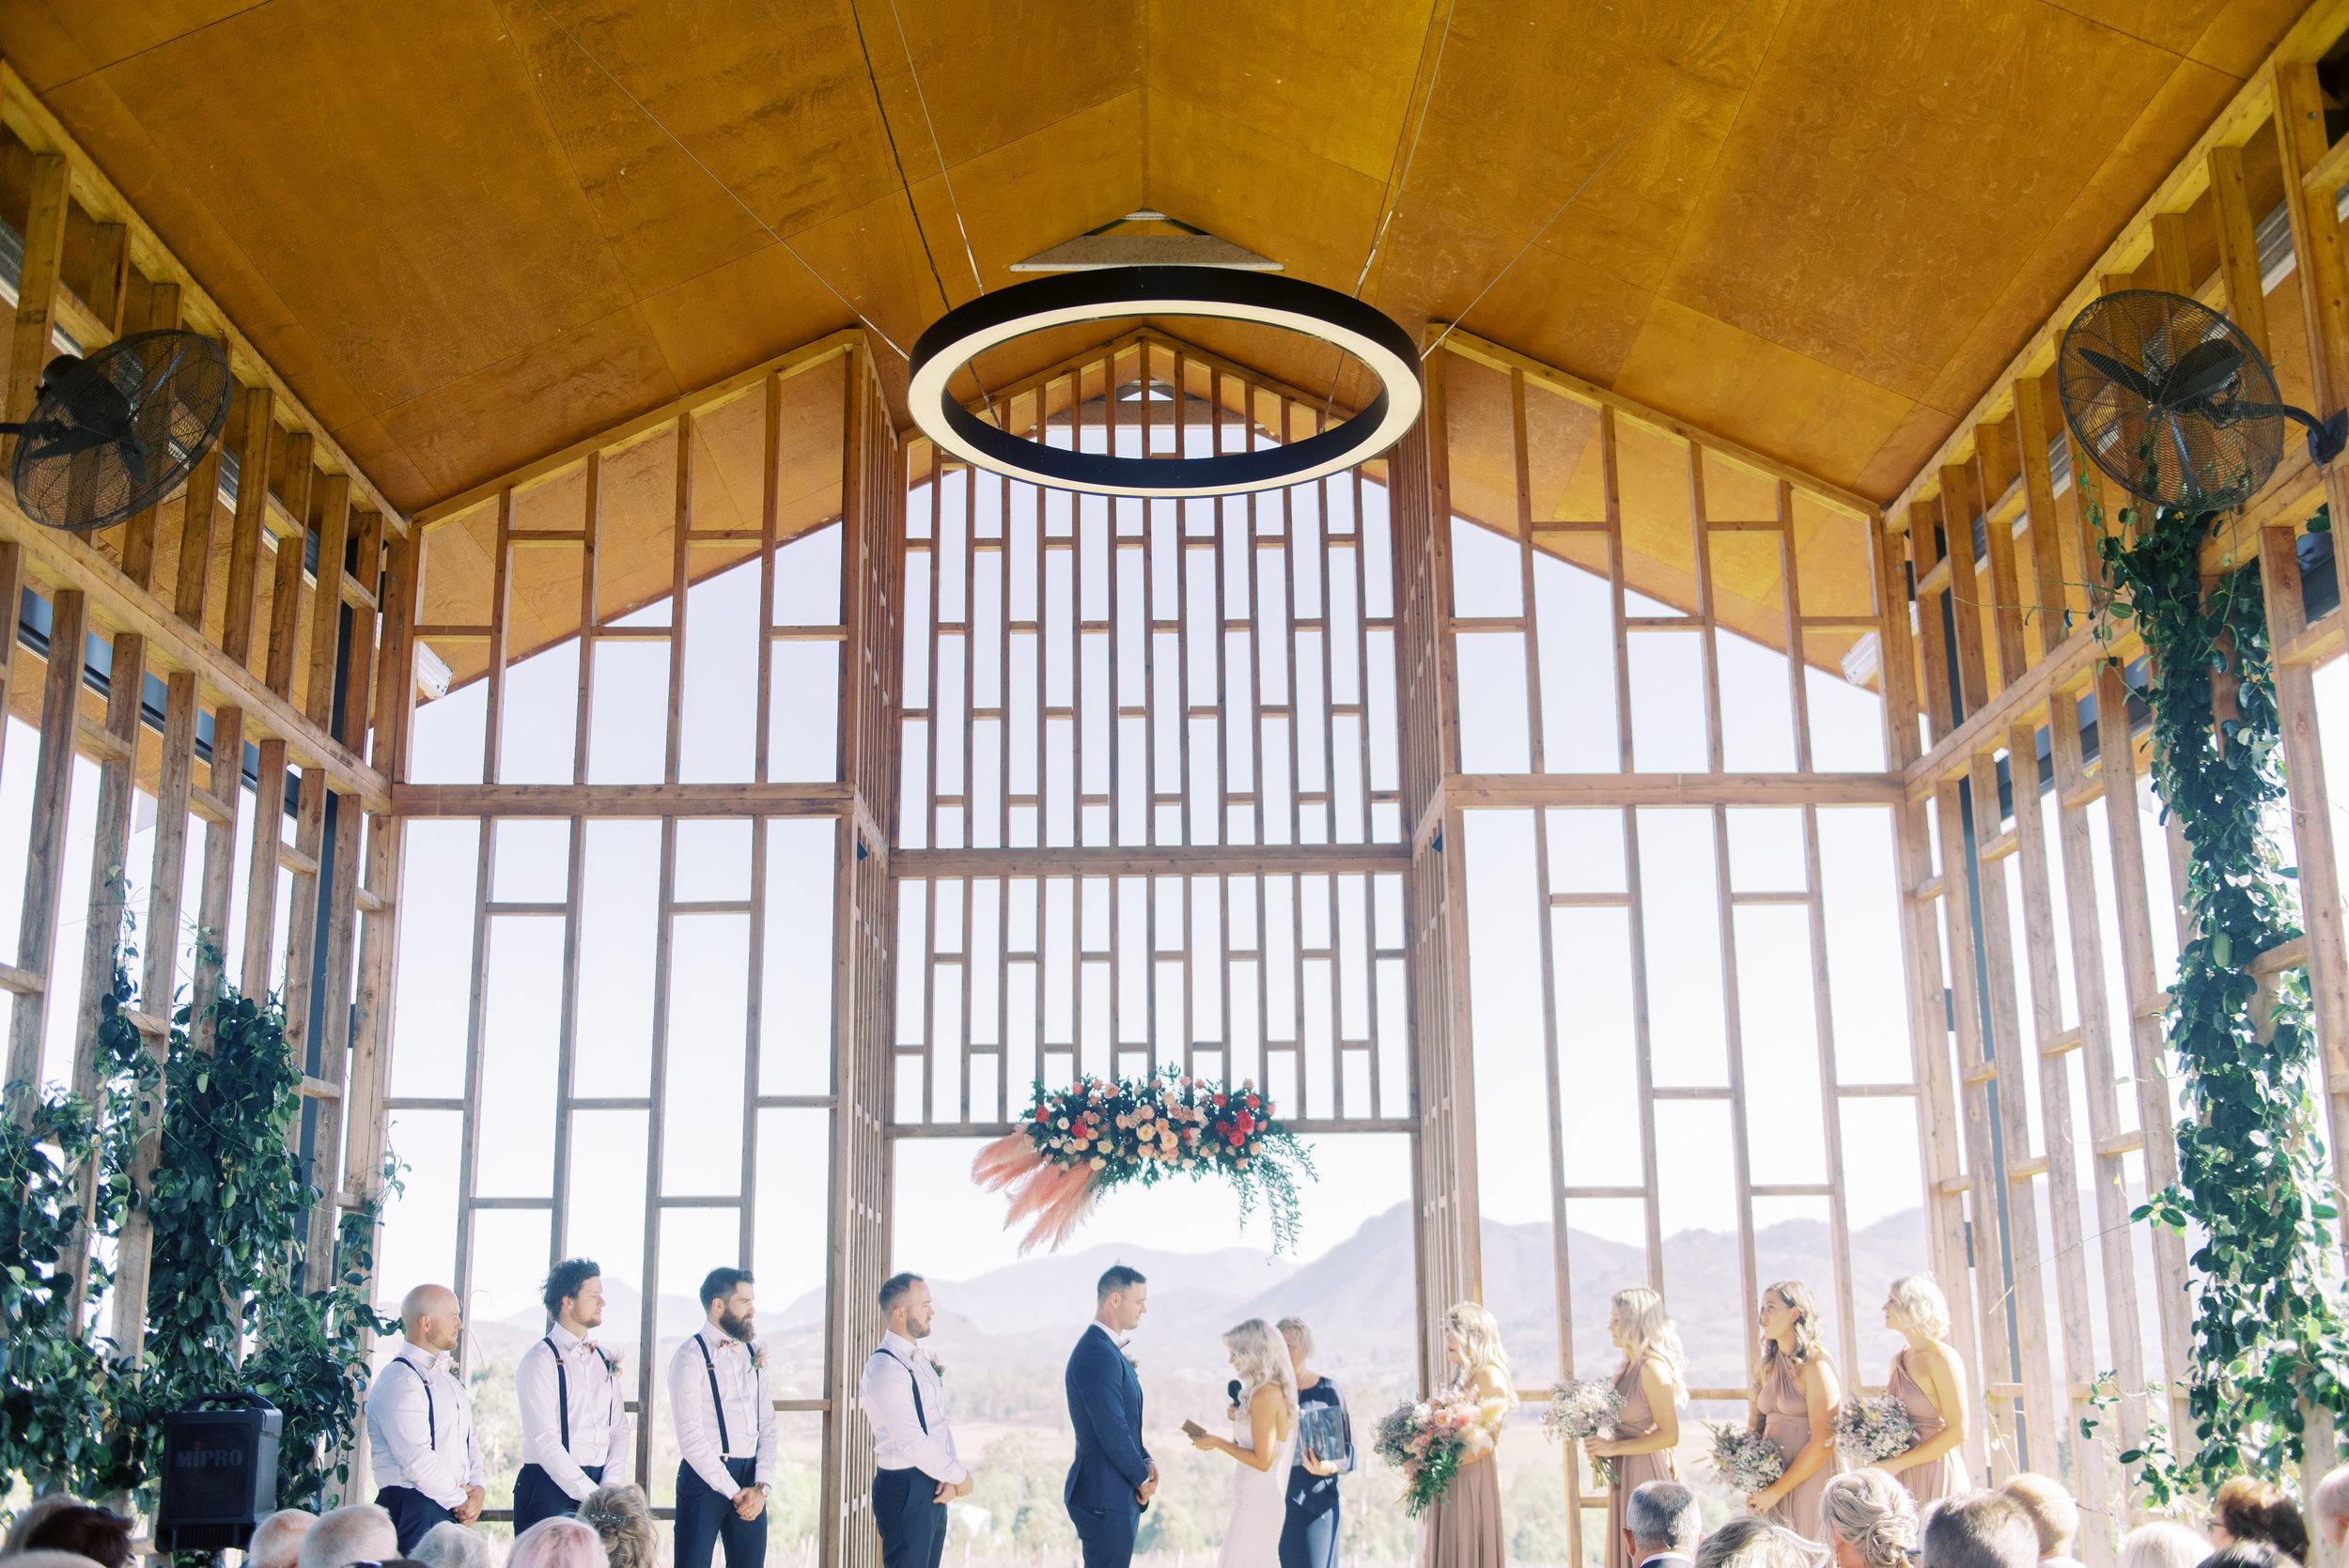 Kooroomba-Vineyard-Lavender-Farm-Wedding-Fine-Art-Lauren-Olivia-42.jpg